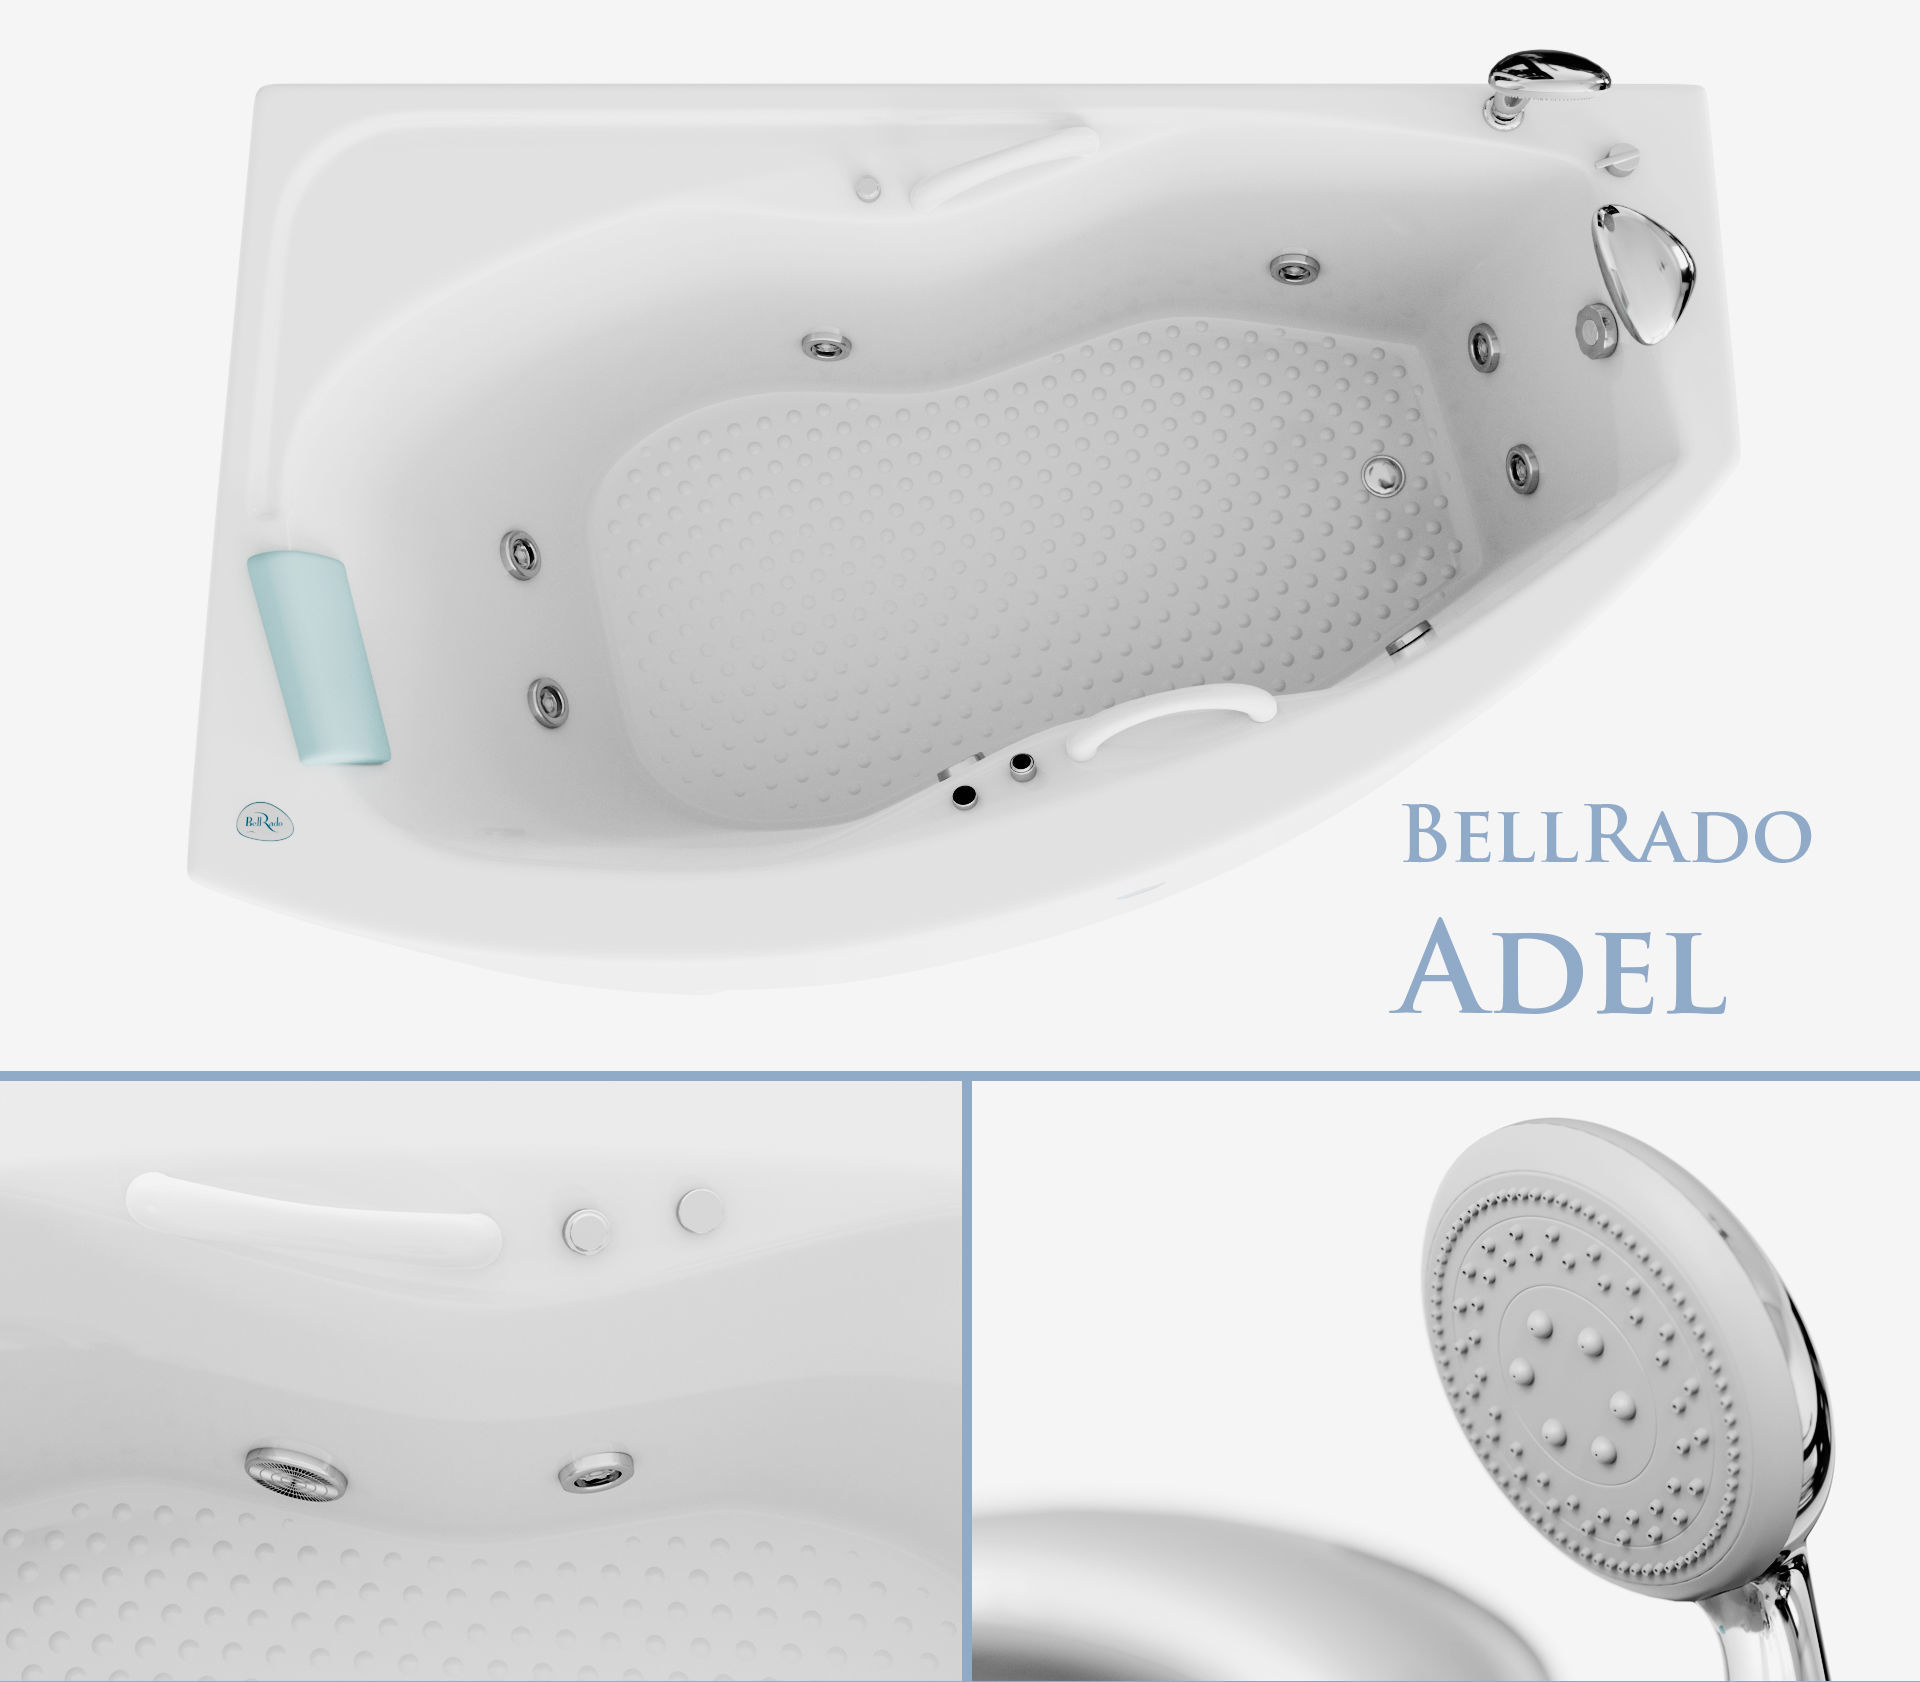 Hydromassage bath Adel